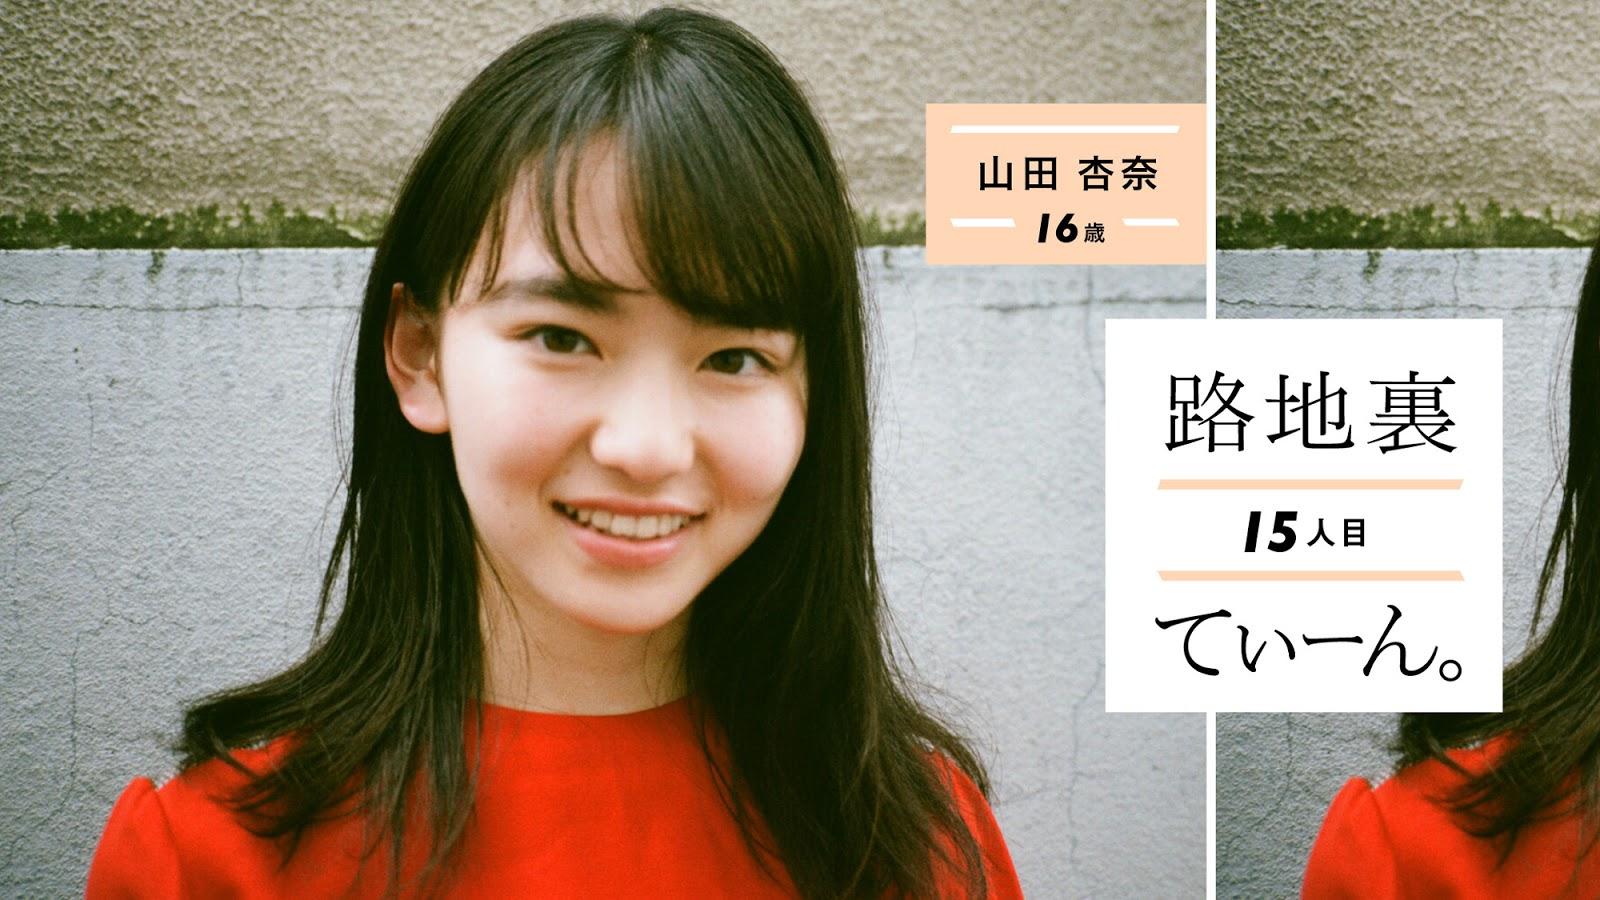 Discussion on this topic: Eileen Daly, yuriko-shiratori-b-1983/